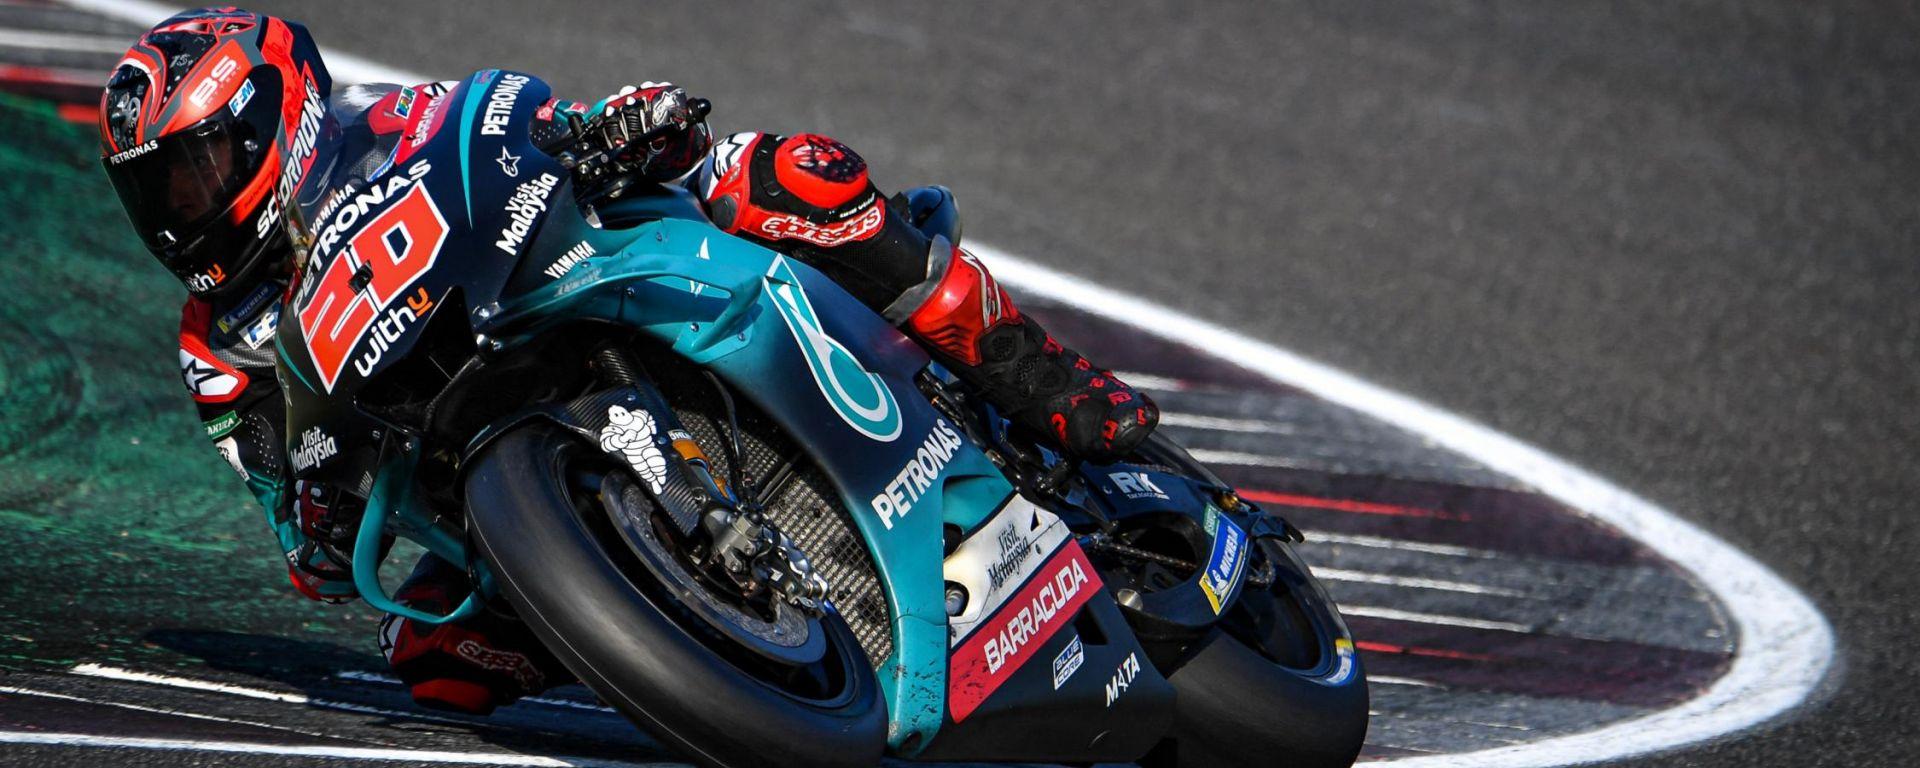 MotoGP San Marino 2019, Misano, Fabio Quartararo (Yamaha)